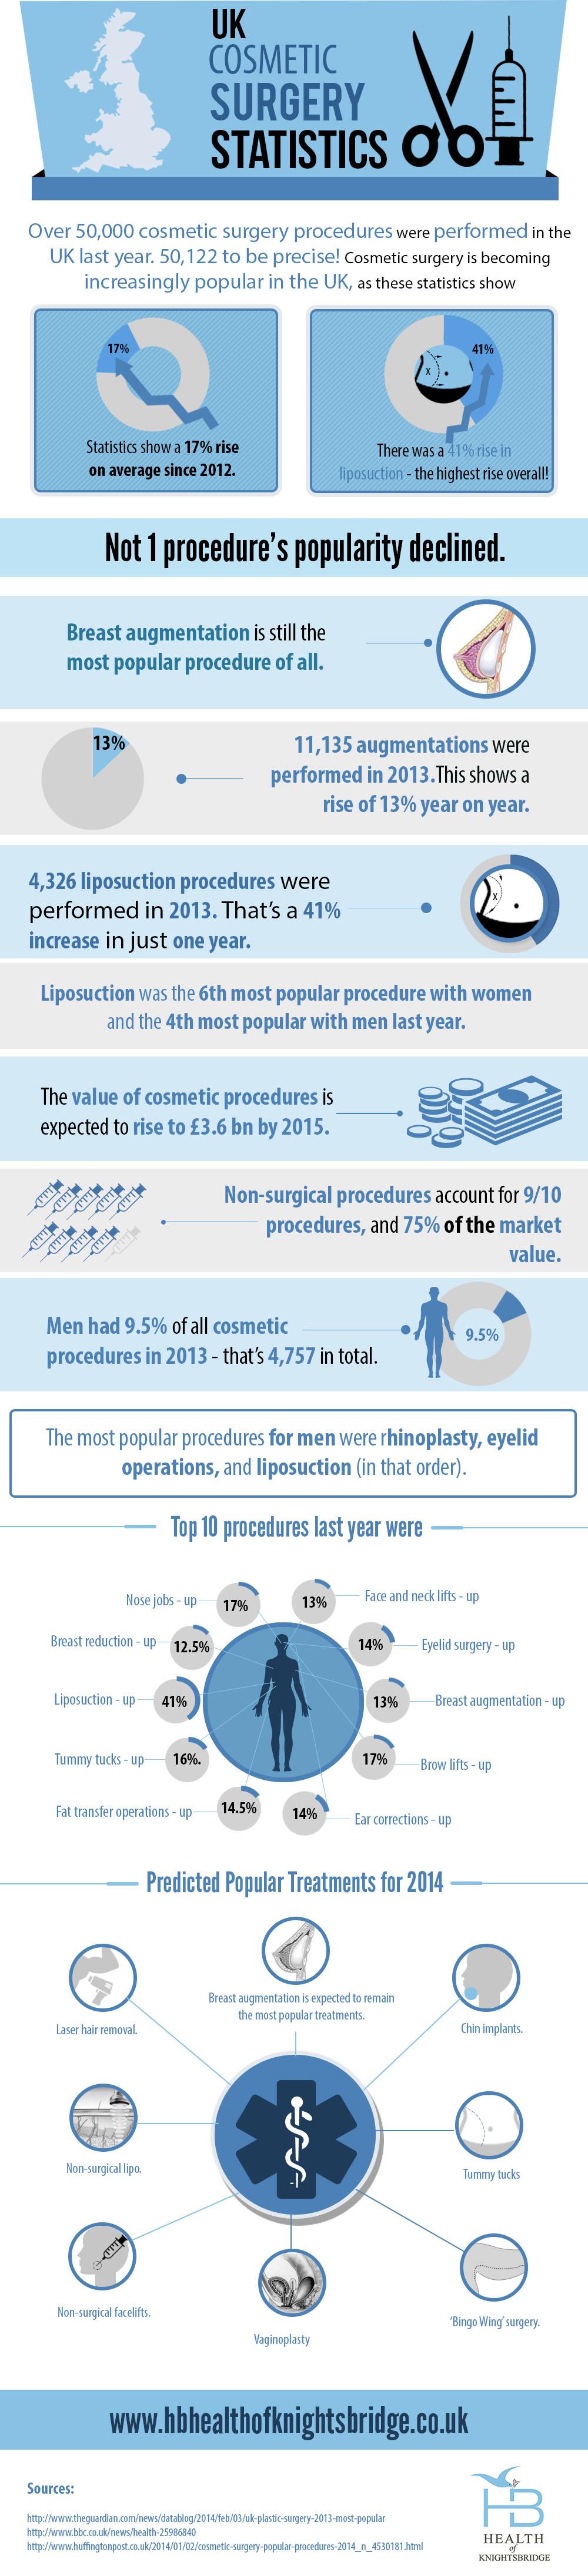 UK Cosmetic Surgery Statistics